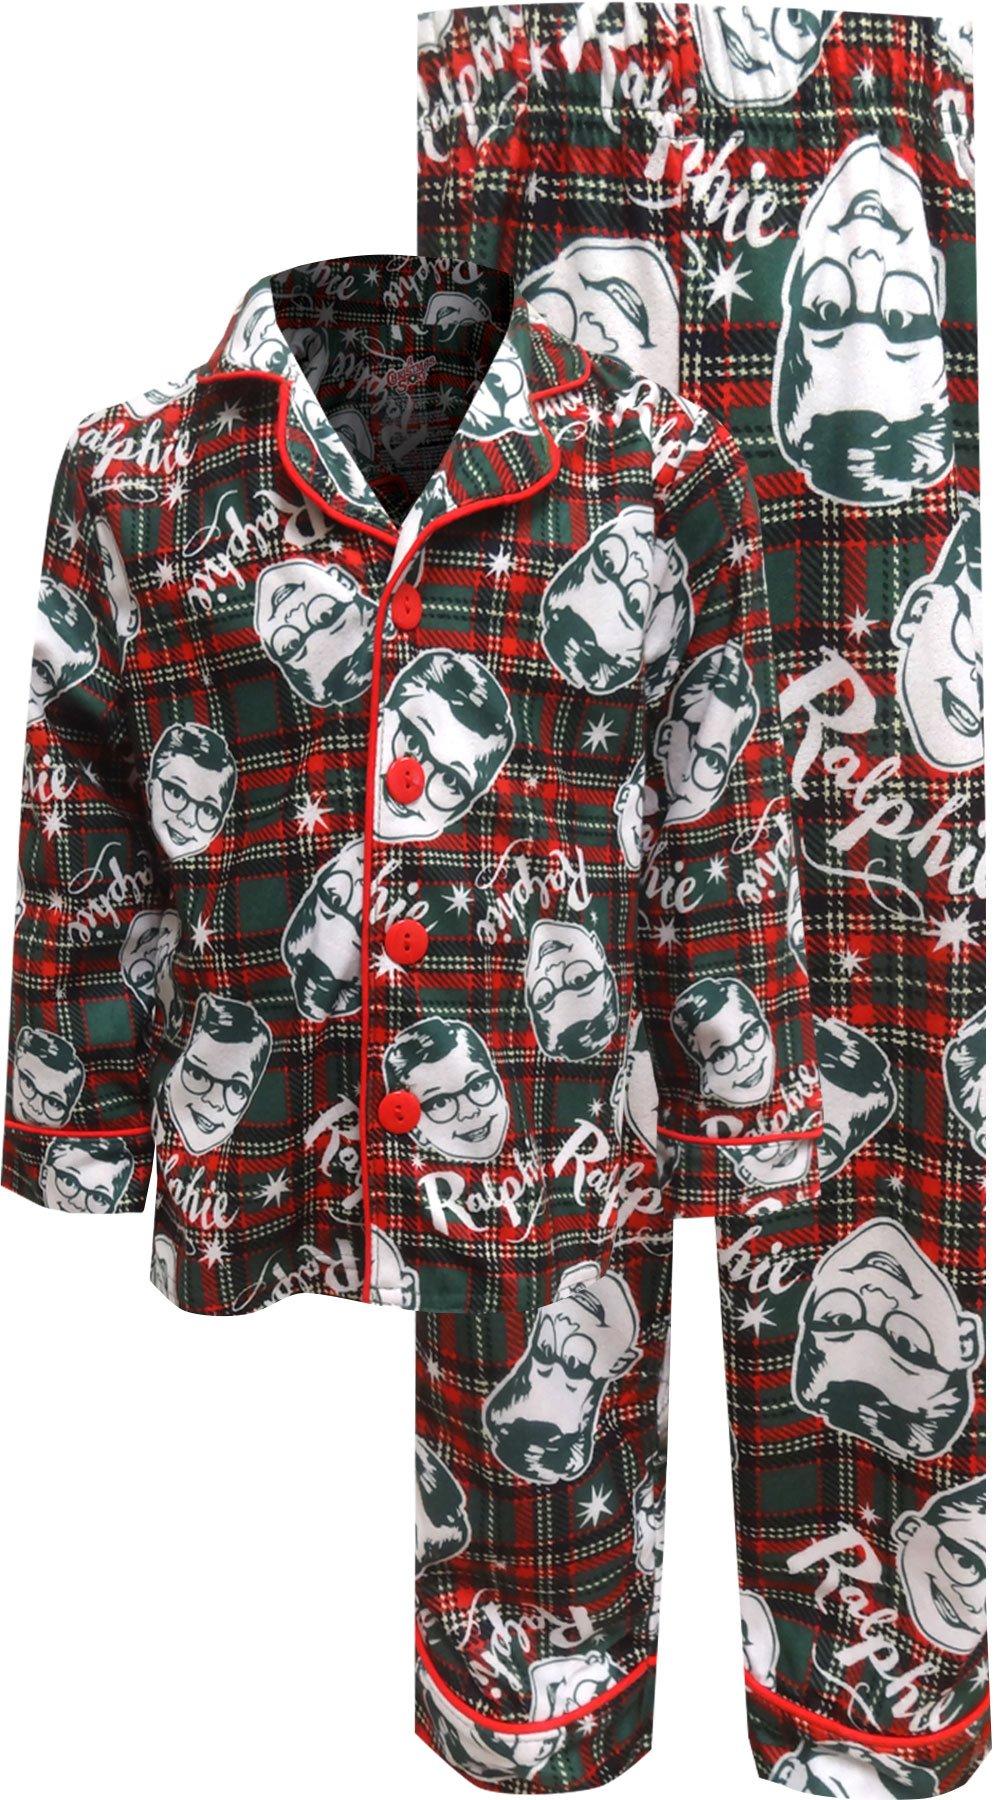 A Christmas Story Boys 'Ralphie Glasses Santa' Christmas Holiday Flannel Plaid Button Pajama Set, Green, 6/7